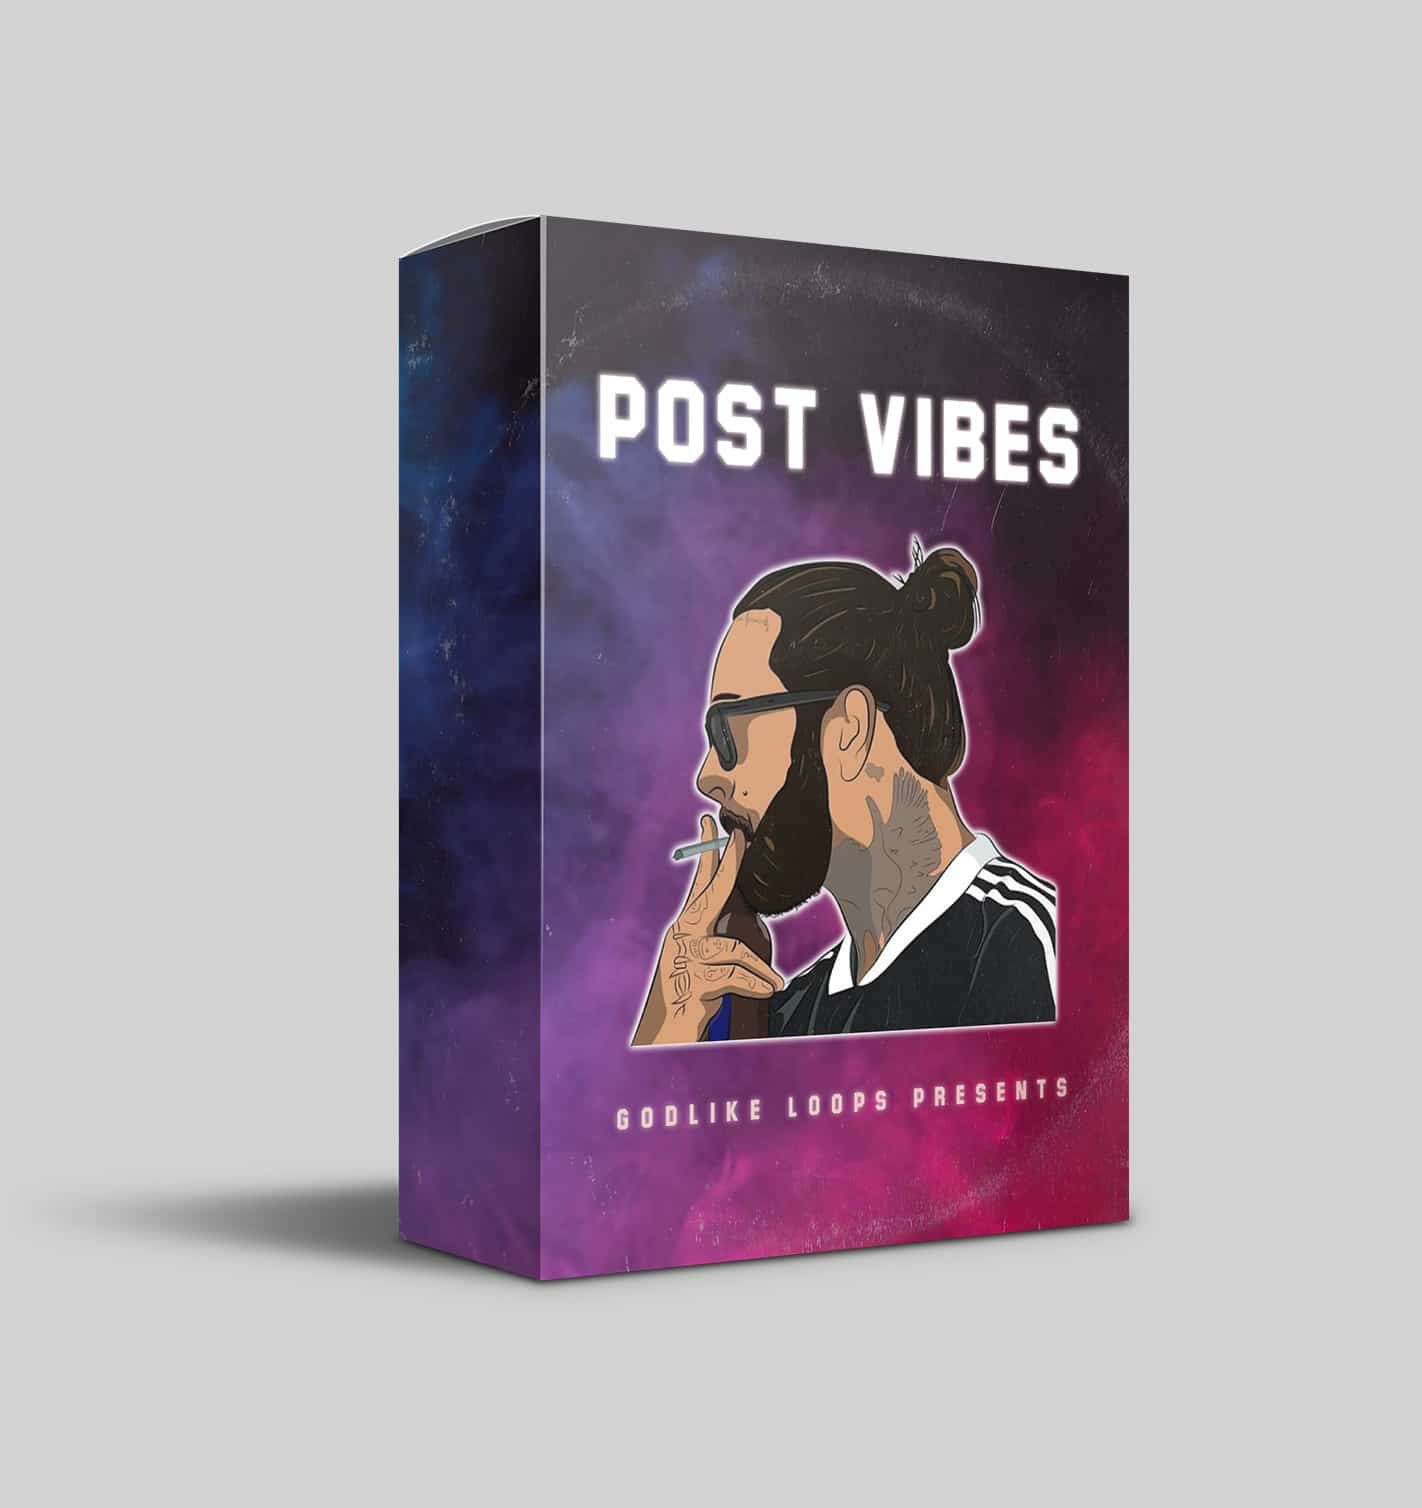 Godlike Loops - Post Vibes